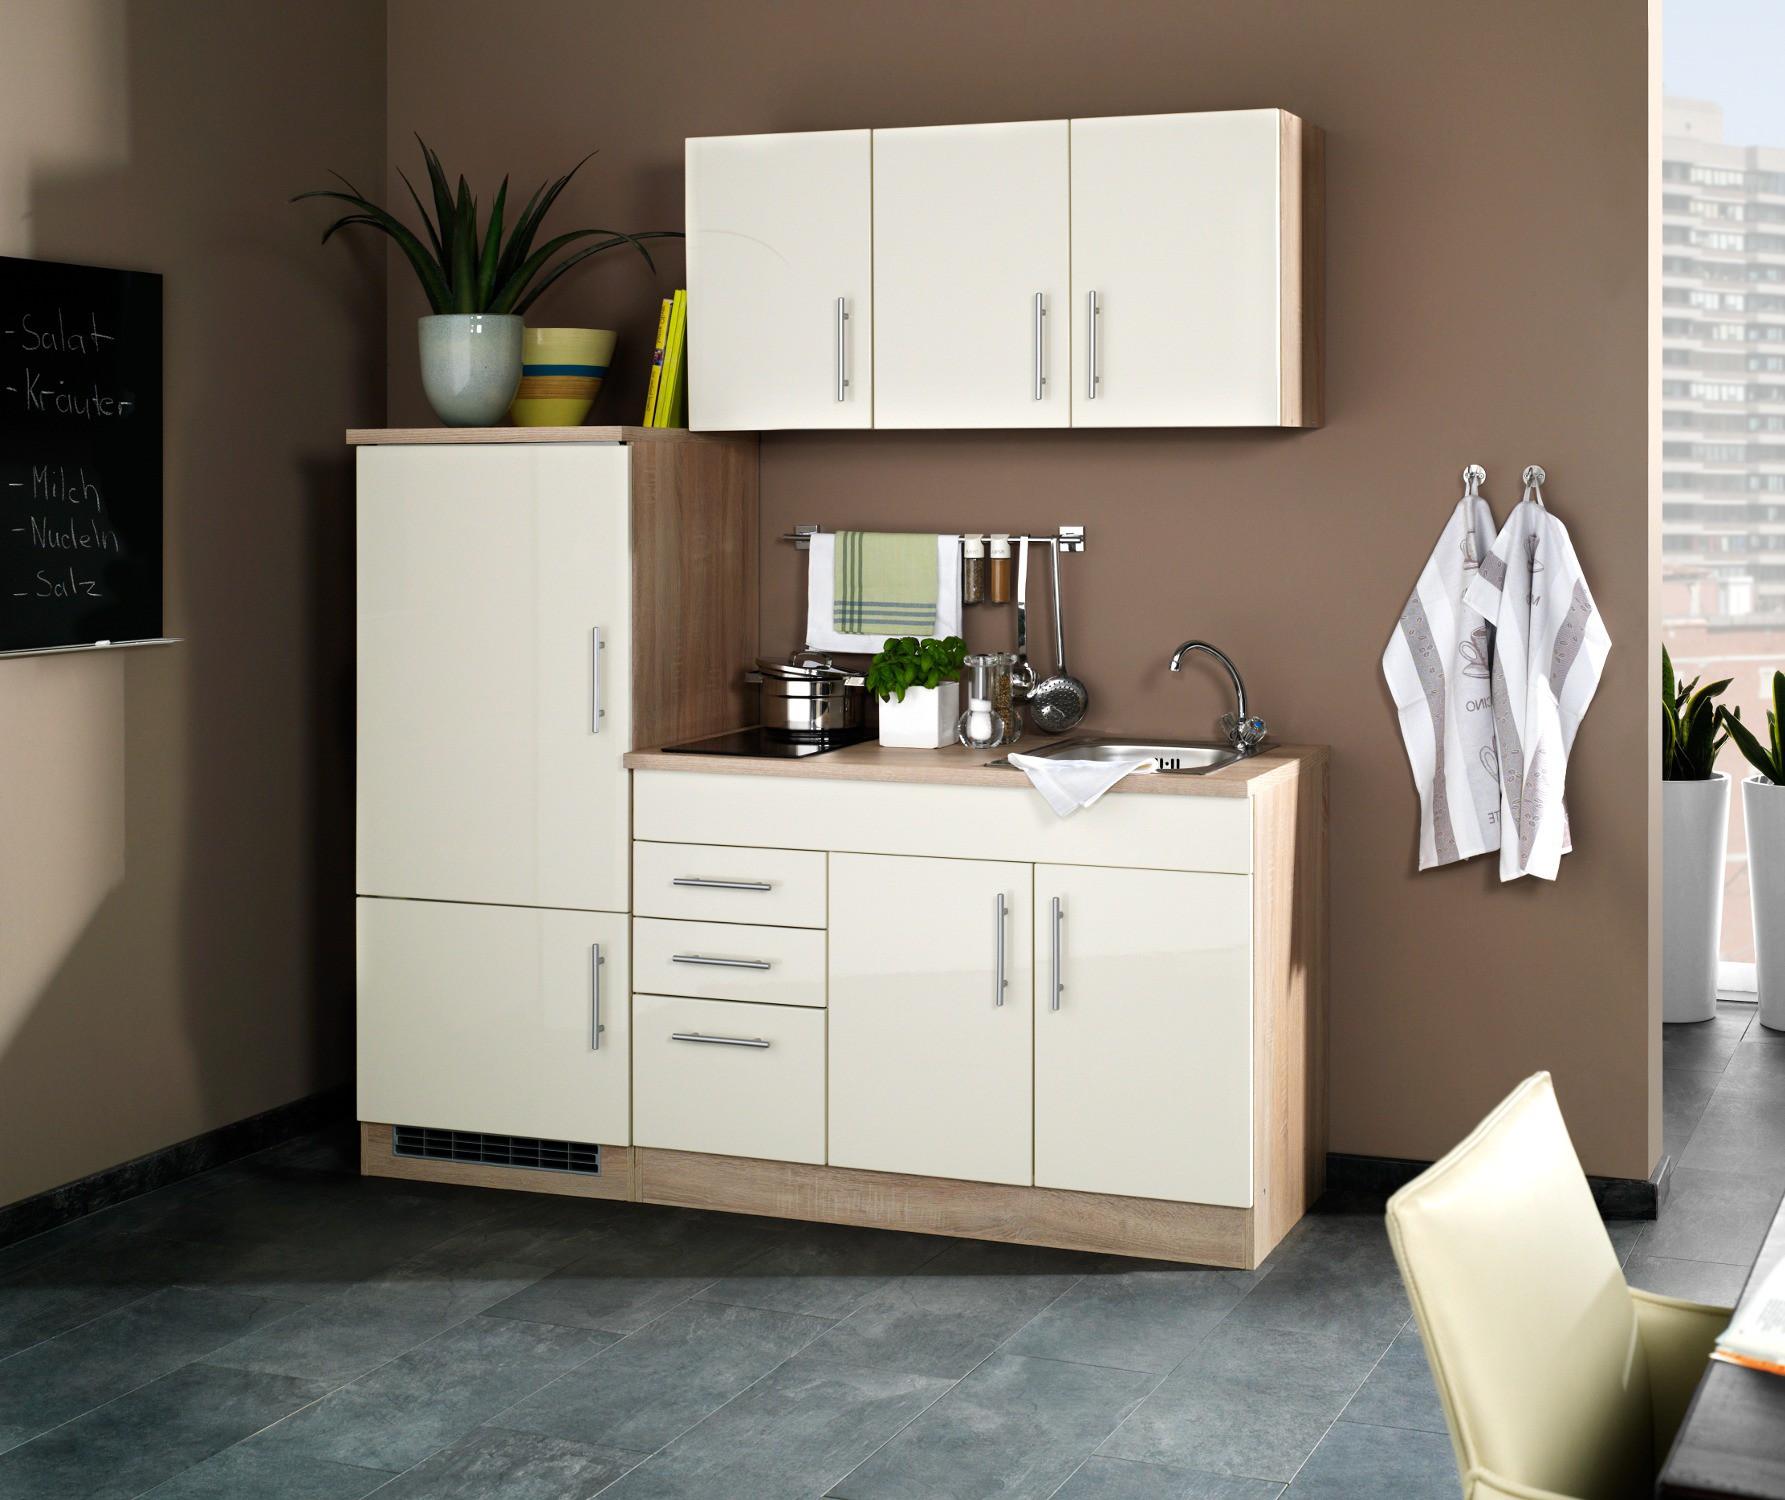 singlek che berlin glaskeramik kochfeld breite 180 cm hochglanz creme eiche sonoma k che. Black Bedroom Furniture Sets. Home Design Ideas